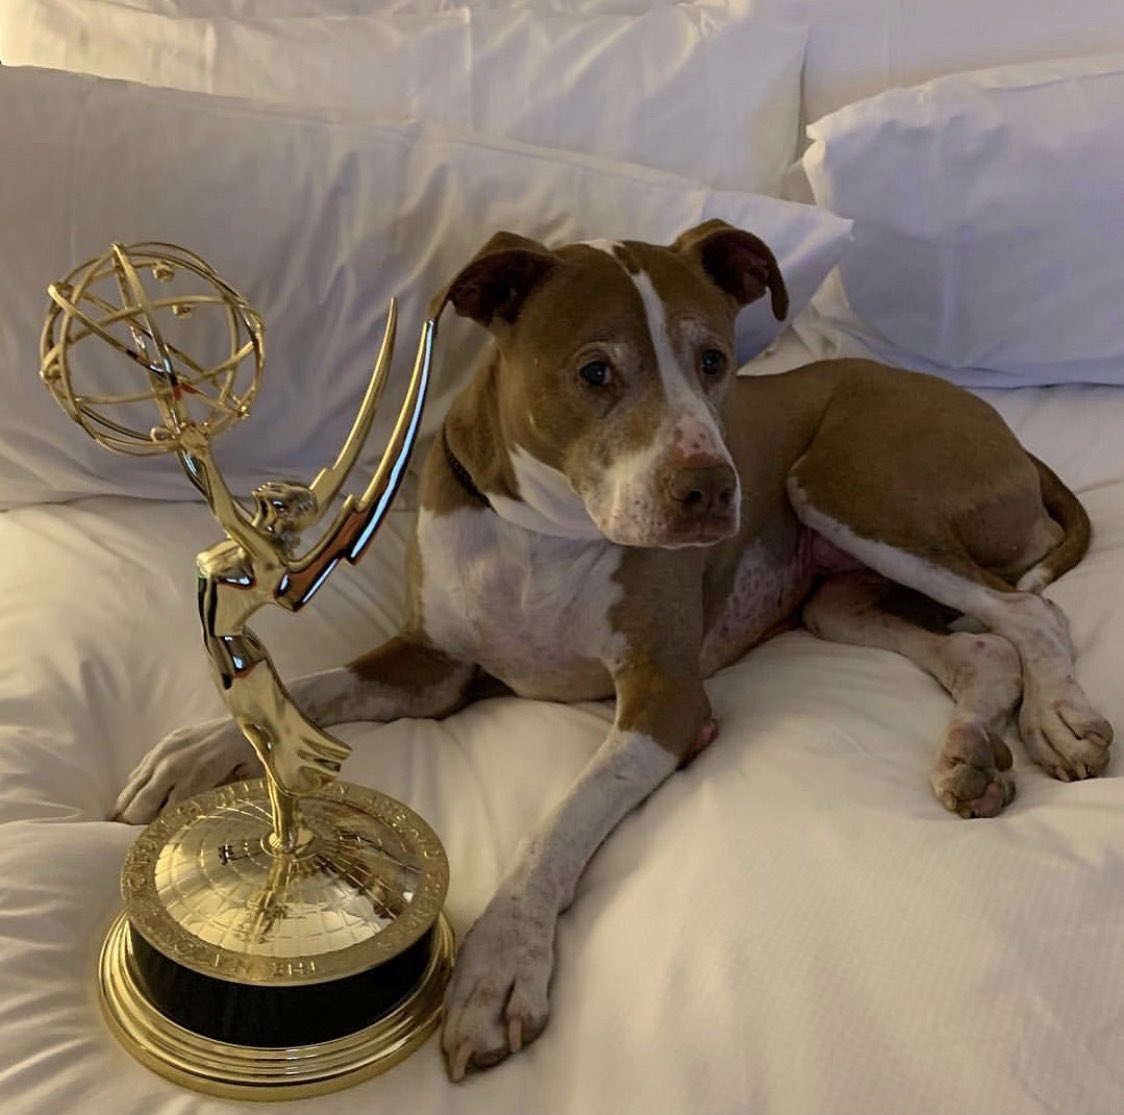 RT @rachaelray: Izzy and Emmy #rachaelrayshow #Emmys https://t.co/dM3OOJqg6u